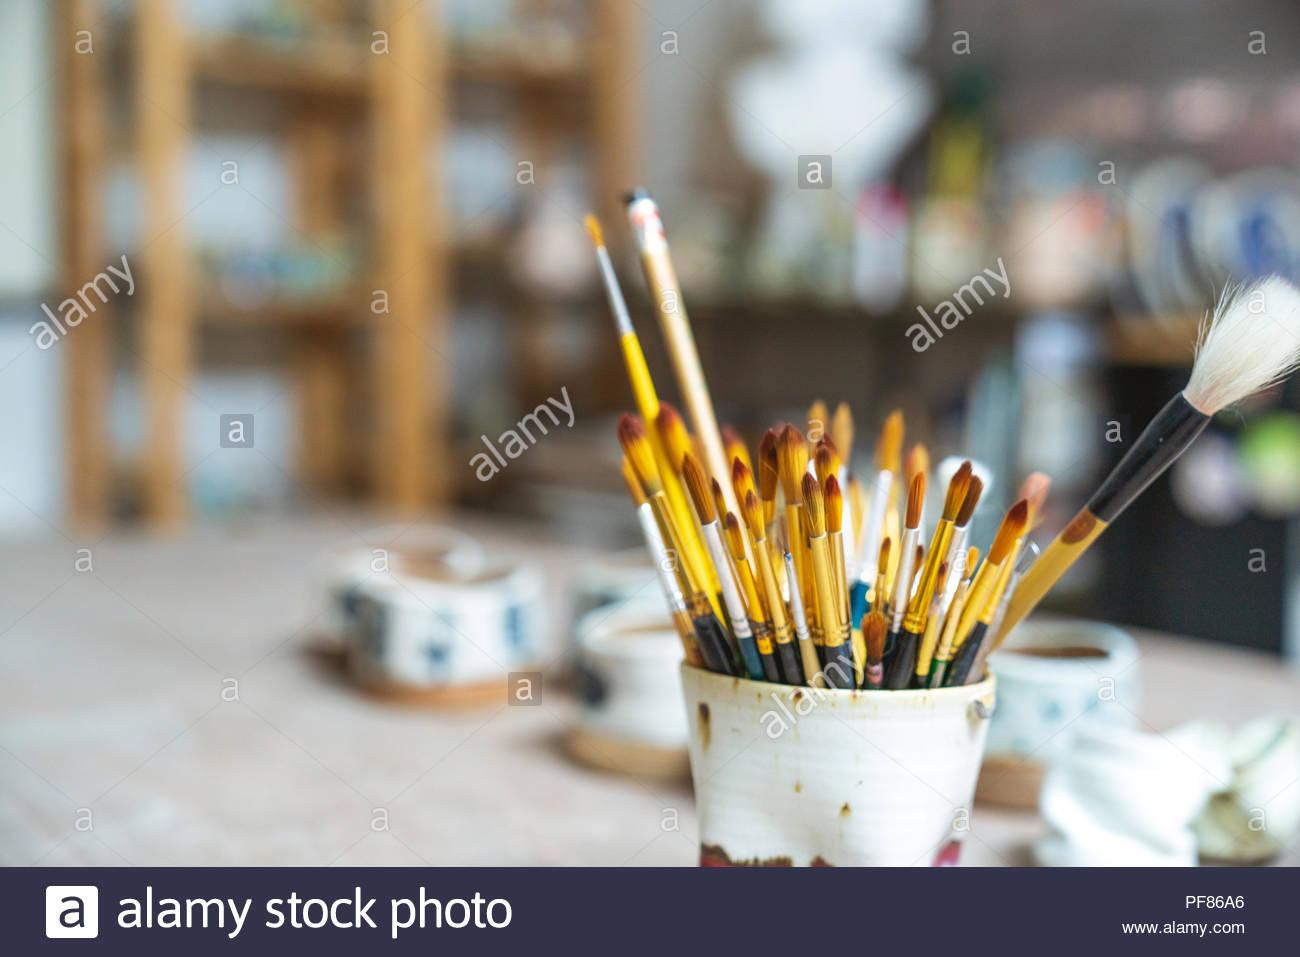 Artistic paint brushes - Stock Image